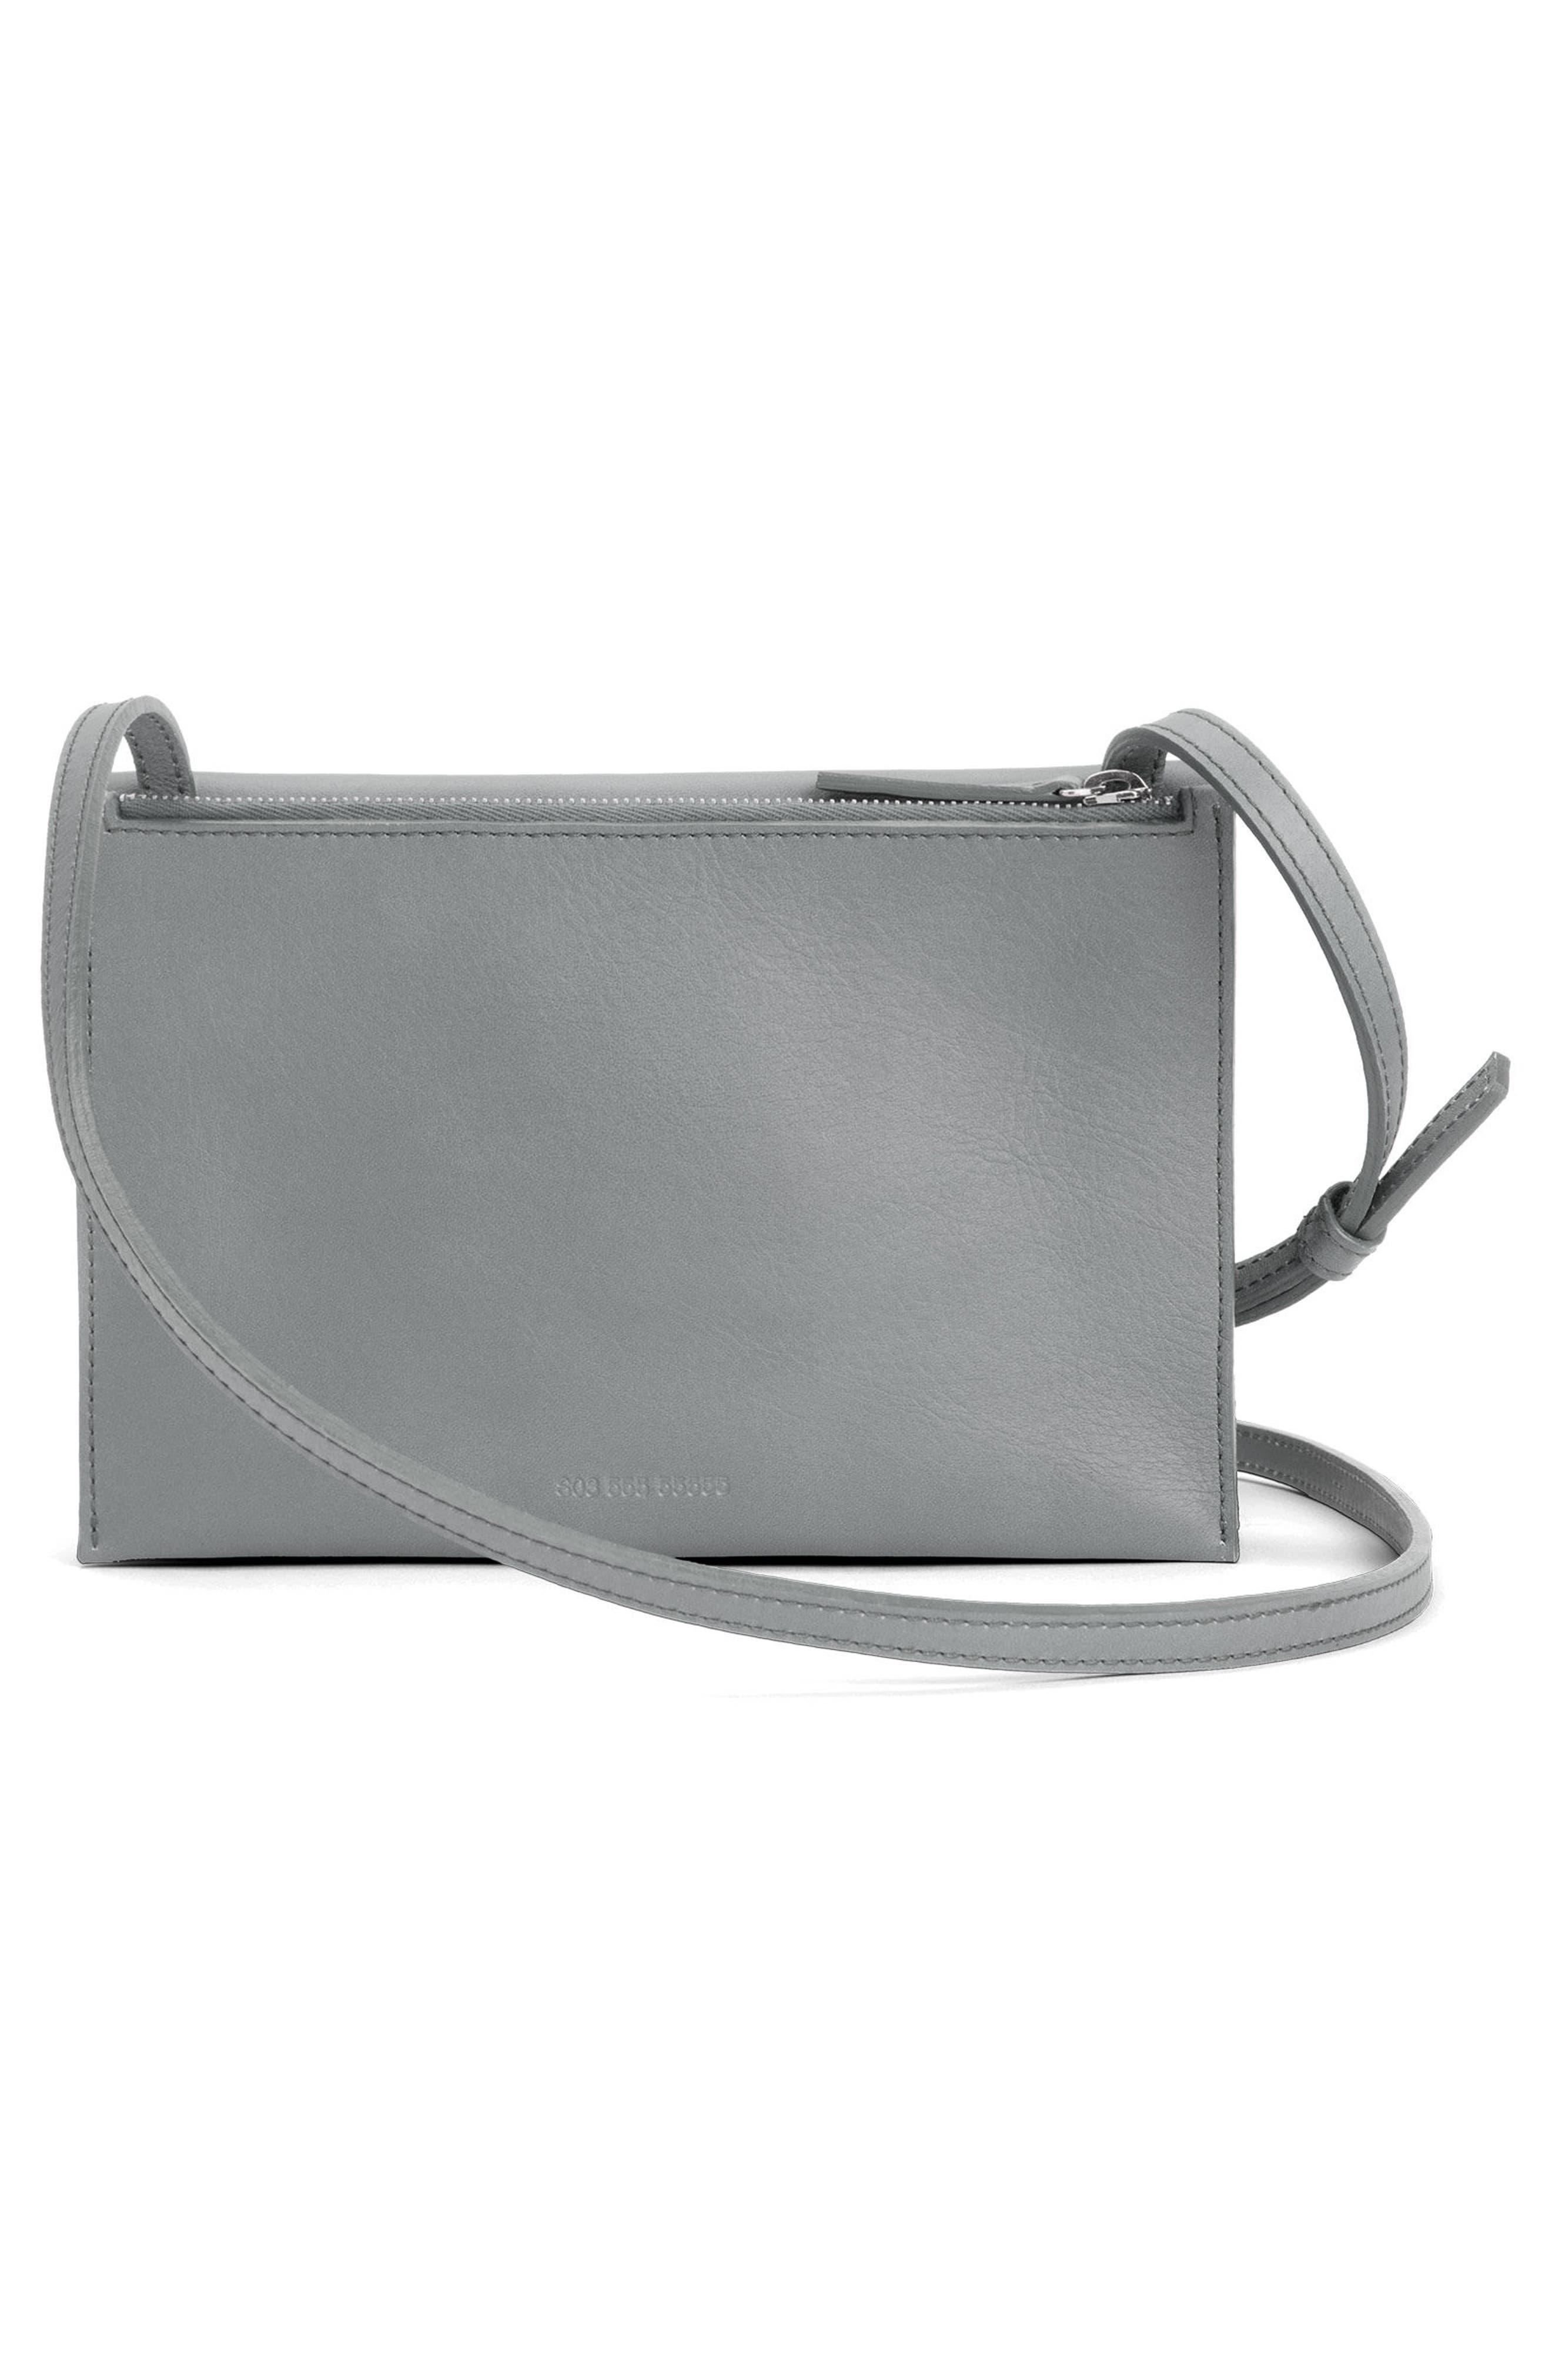 Crossbody Leather Bag,                             Alternate thumbnail 2, color,                             Cool Grey